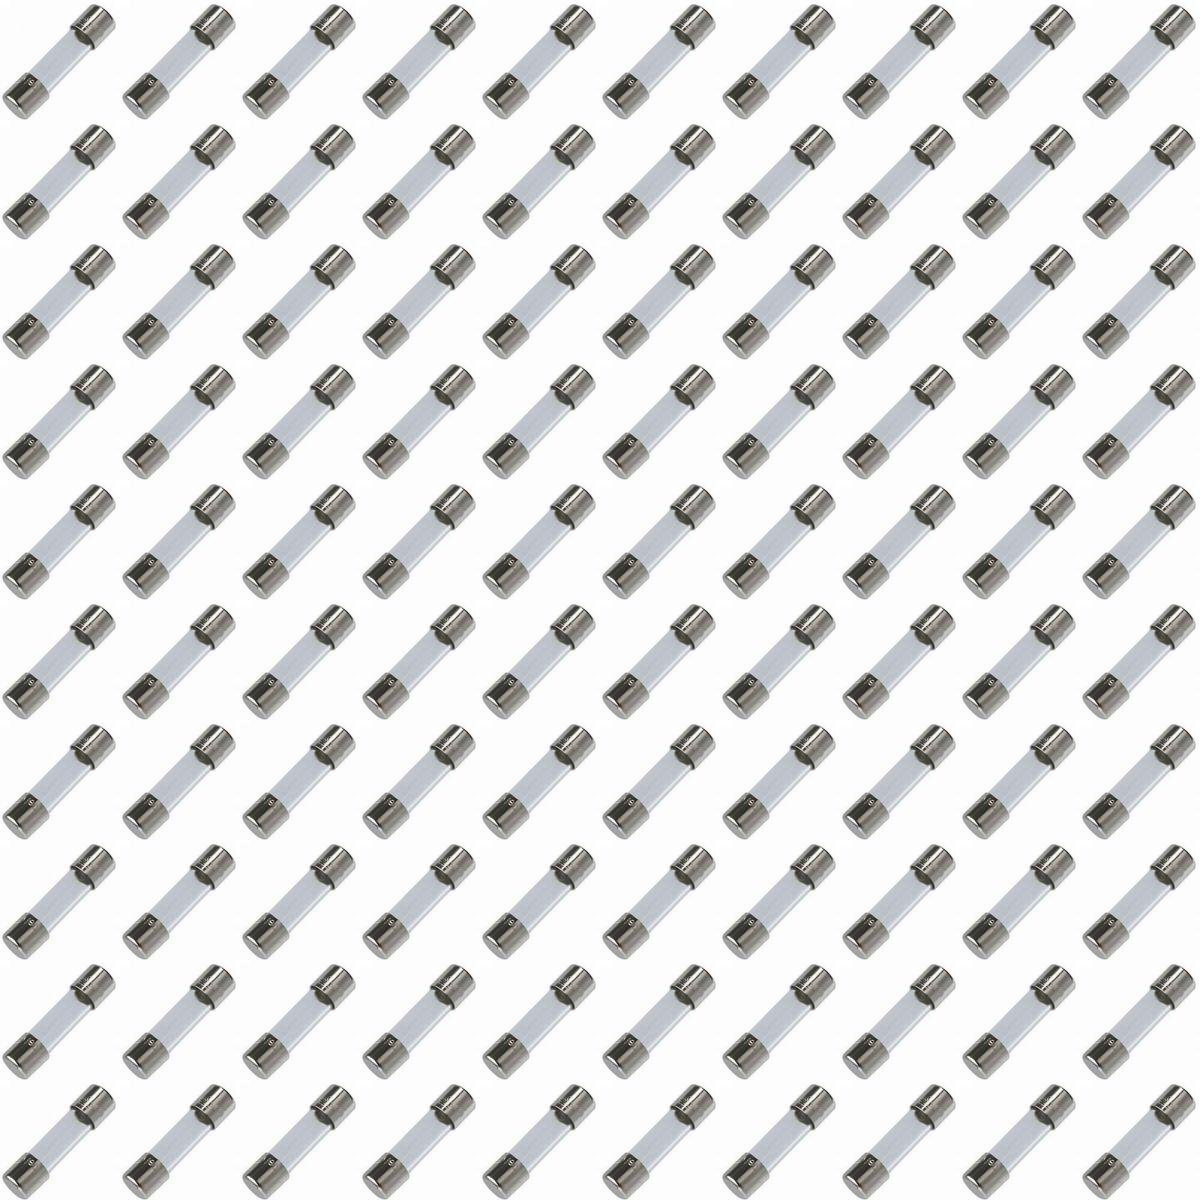 Pacote C/ 100x Fusivel De Vidro 5x20mm 10a